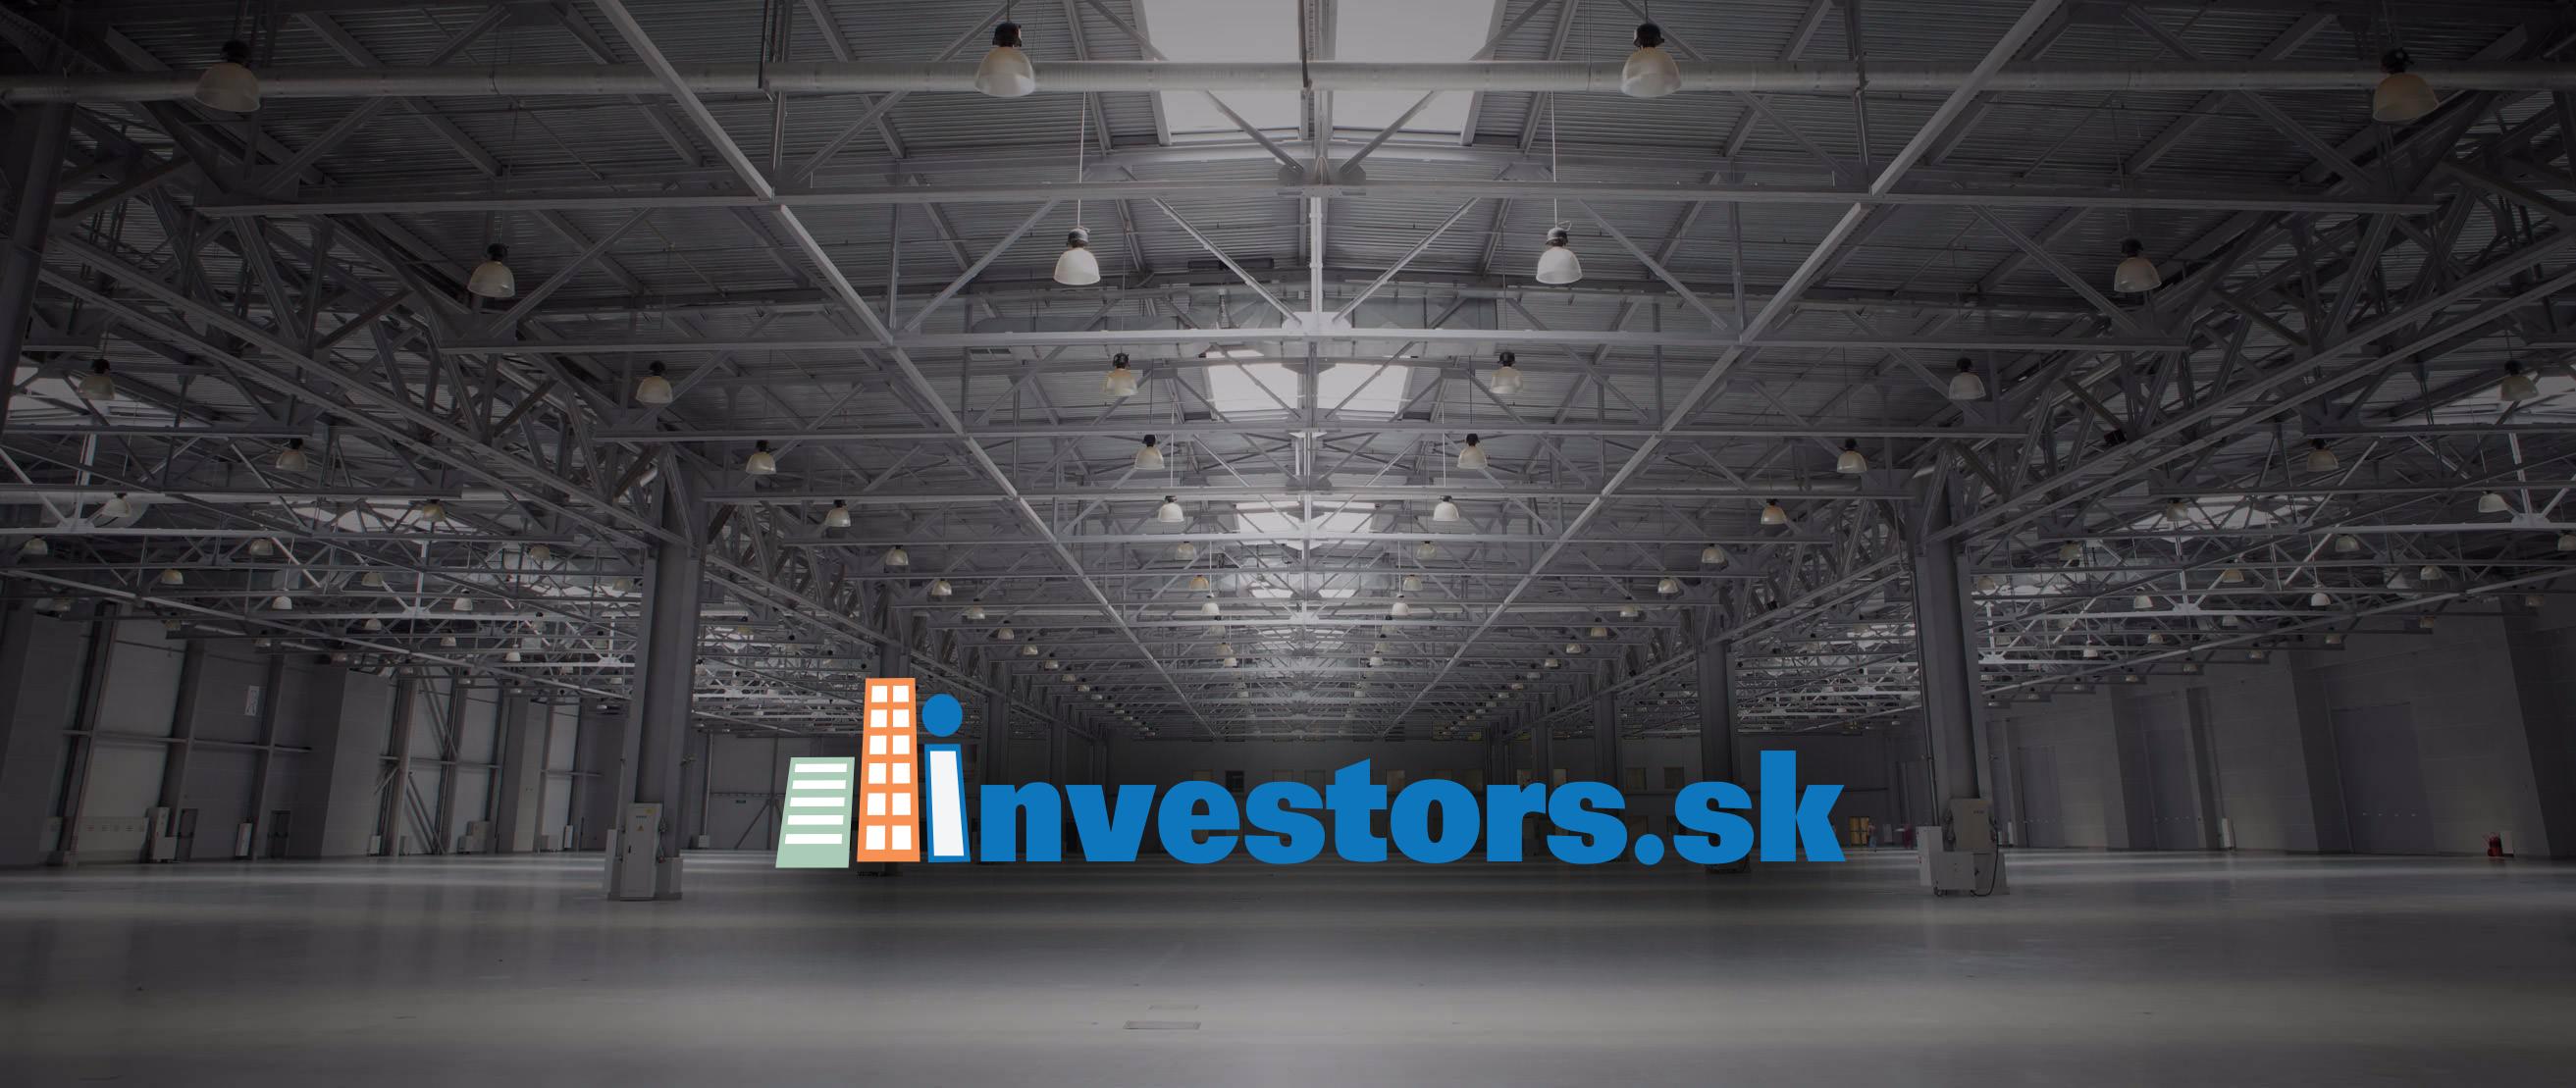 Investors.sk